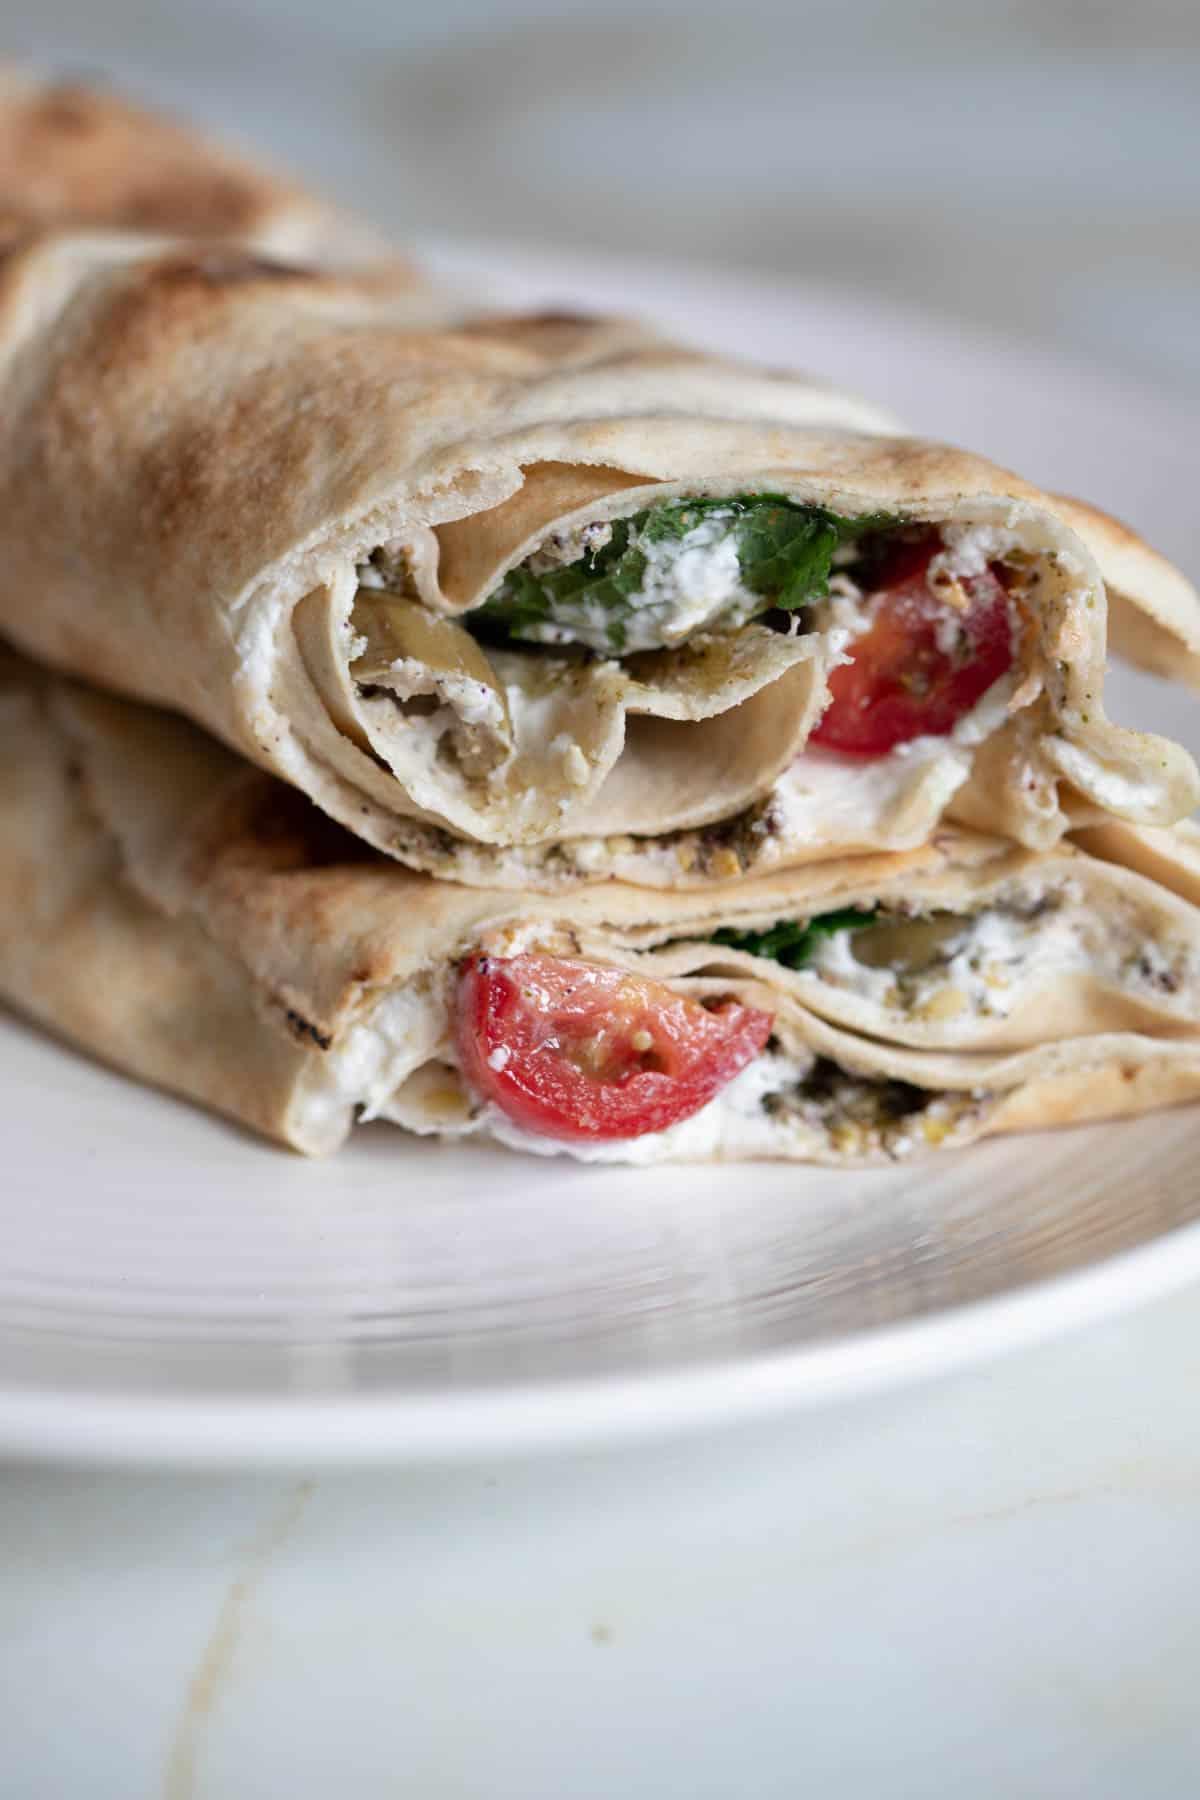 labneh pita sandwich on a plate cut in half